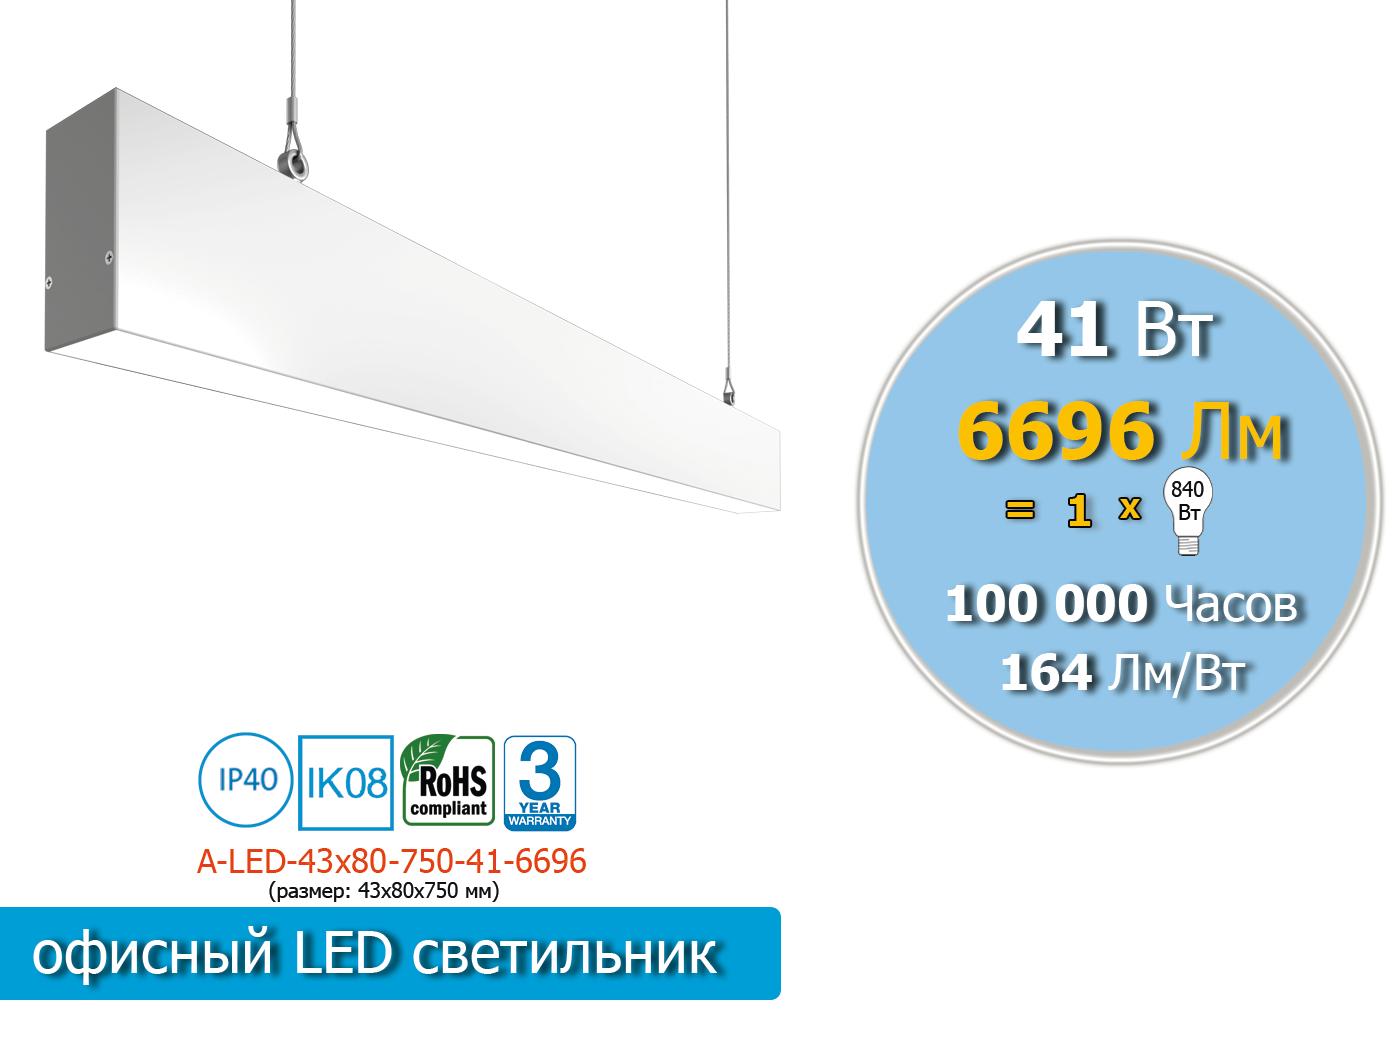 A-LED-43х80-750-41-6696